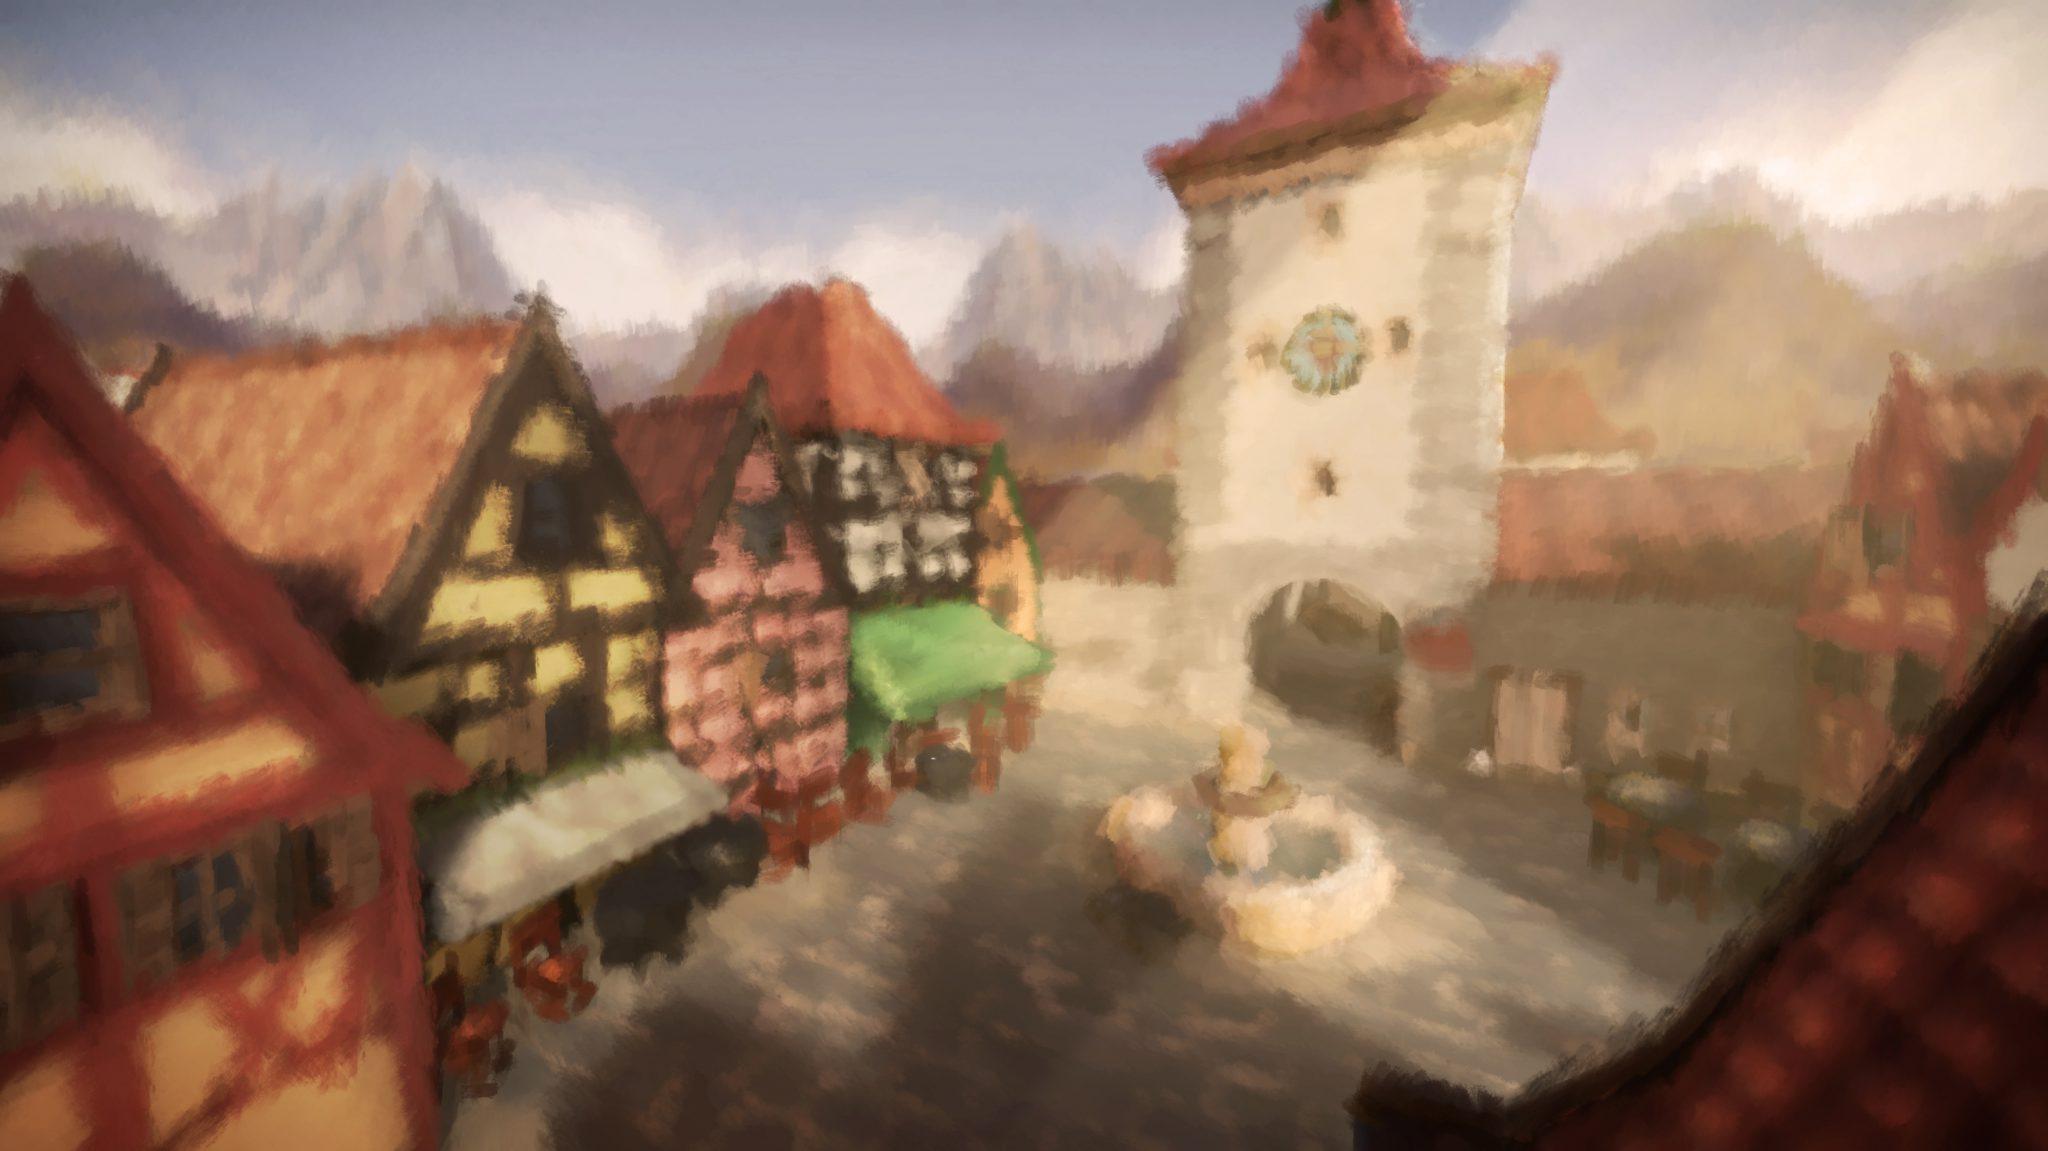 11-11 Memories Retold PS4 Pro Xbox One X Review Kritik Test Bandai Namco Entertainment Anti Kriegsspiel Worldwar I Erster Weltkrieg 1918 11 11 1918 Stadt